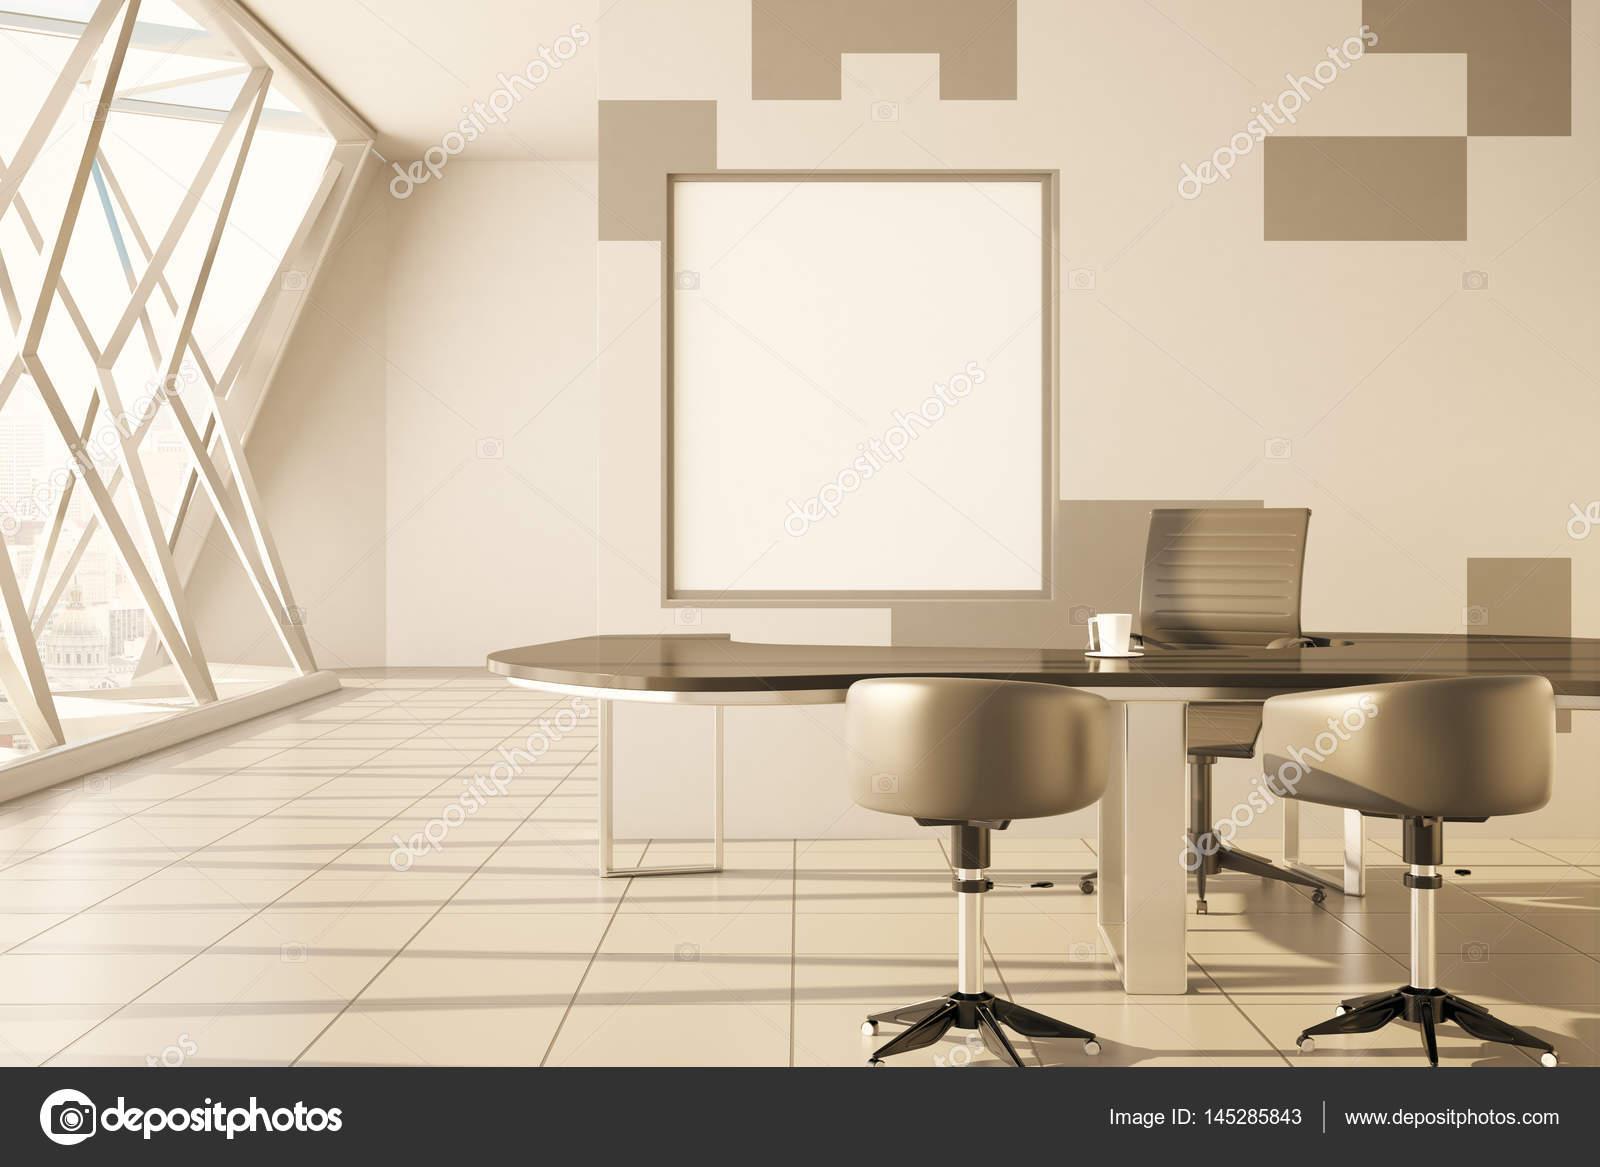 Boarding Raum mit quadratischer Rahmen — Stockfoto © peshkova #145285843